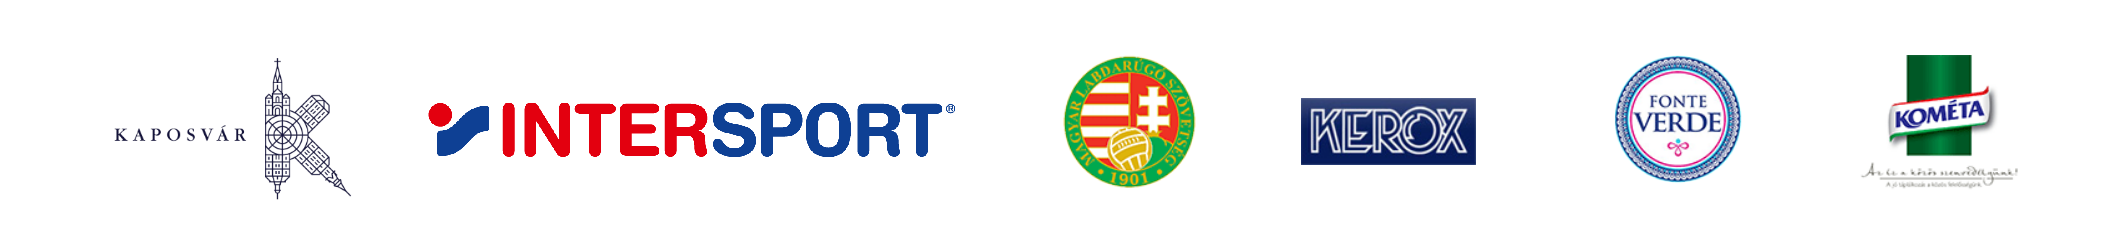 intersport youth football festival sponsors